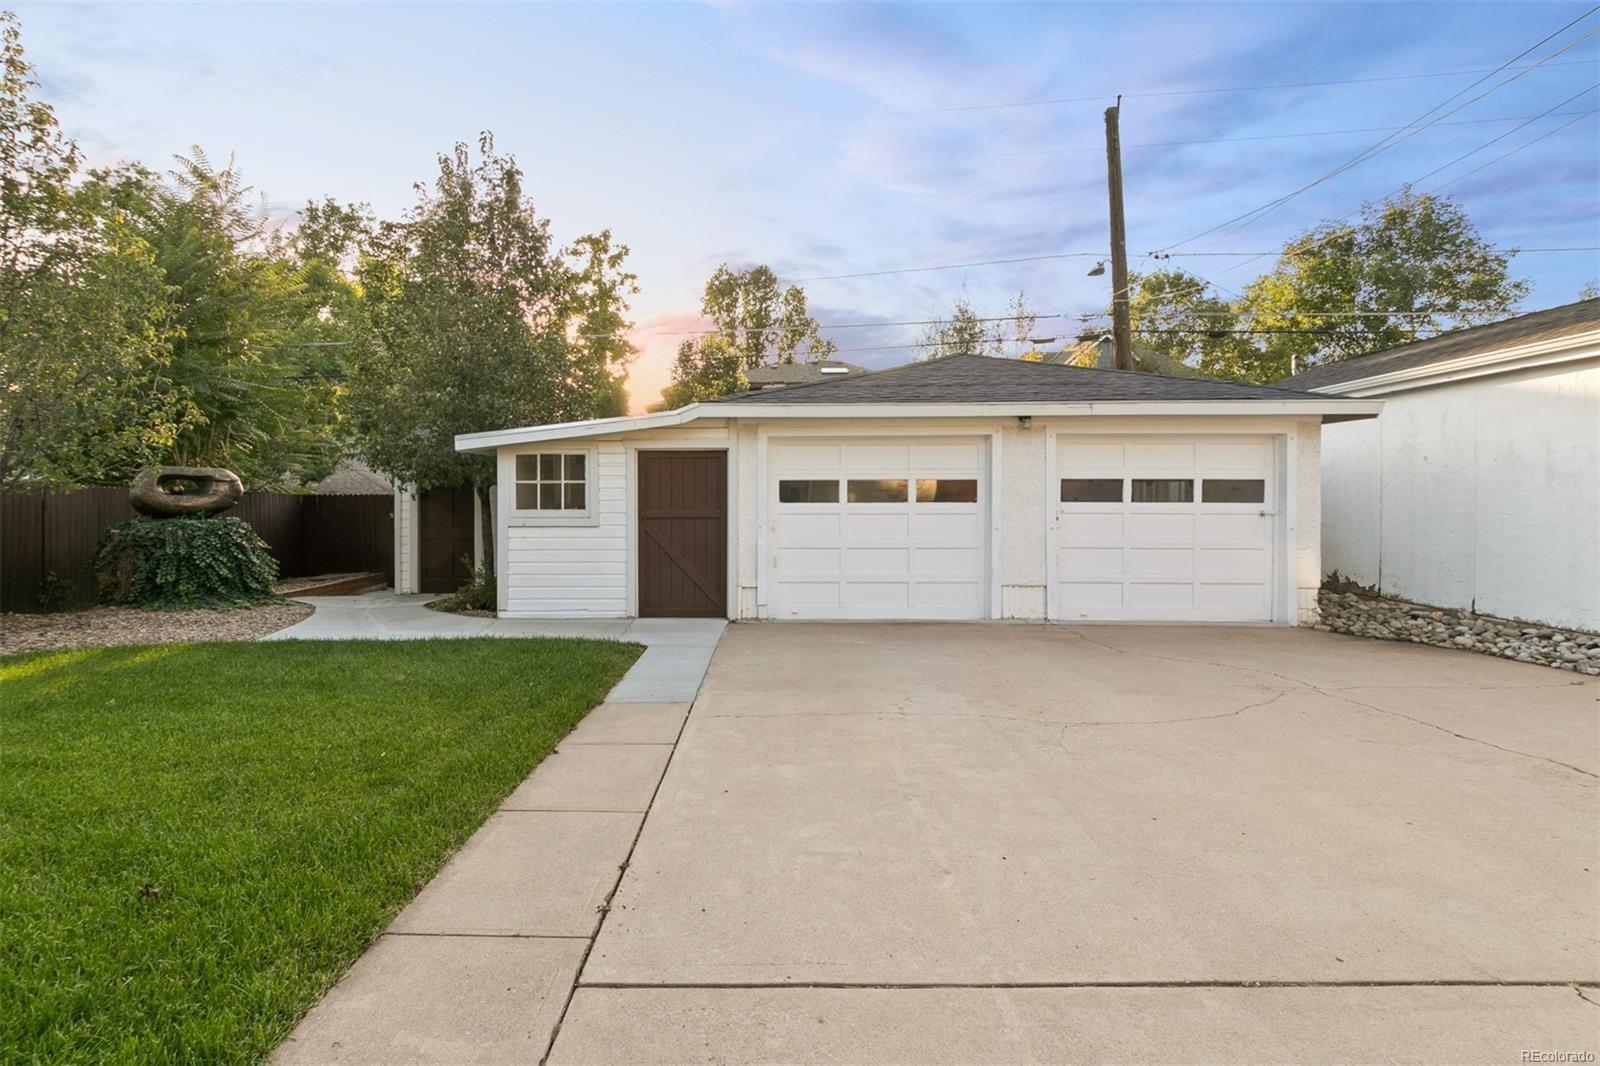 MLS# 5085420 - 1 - 1717  S Humboldt Street, Denver, CO 80210